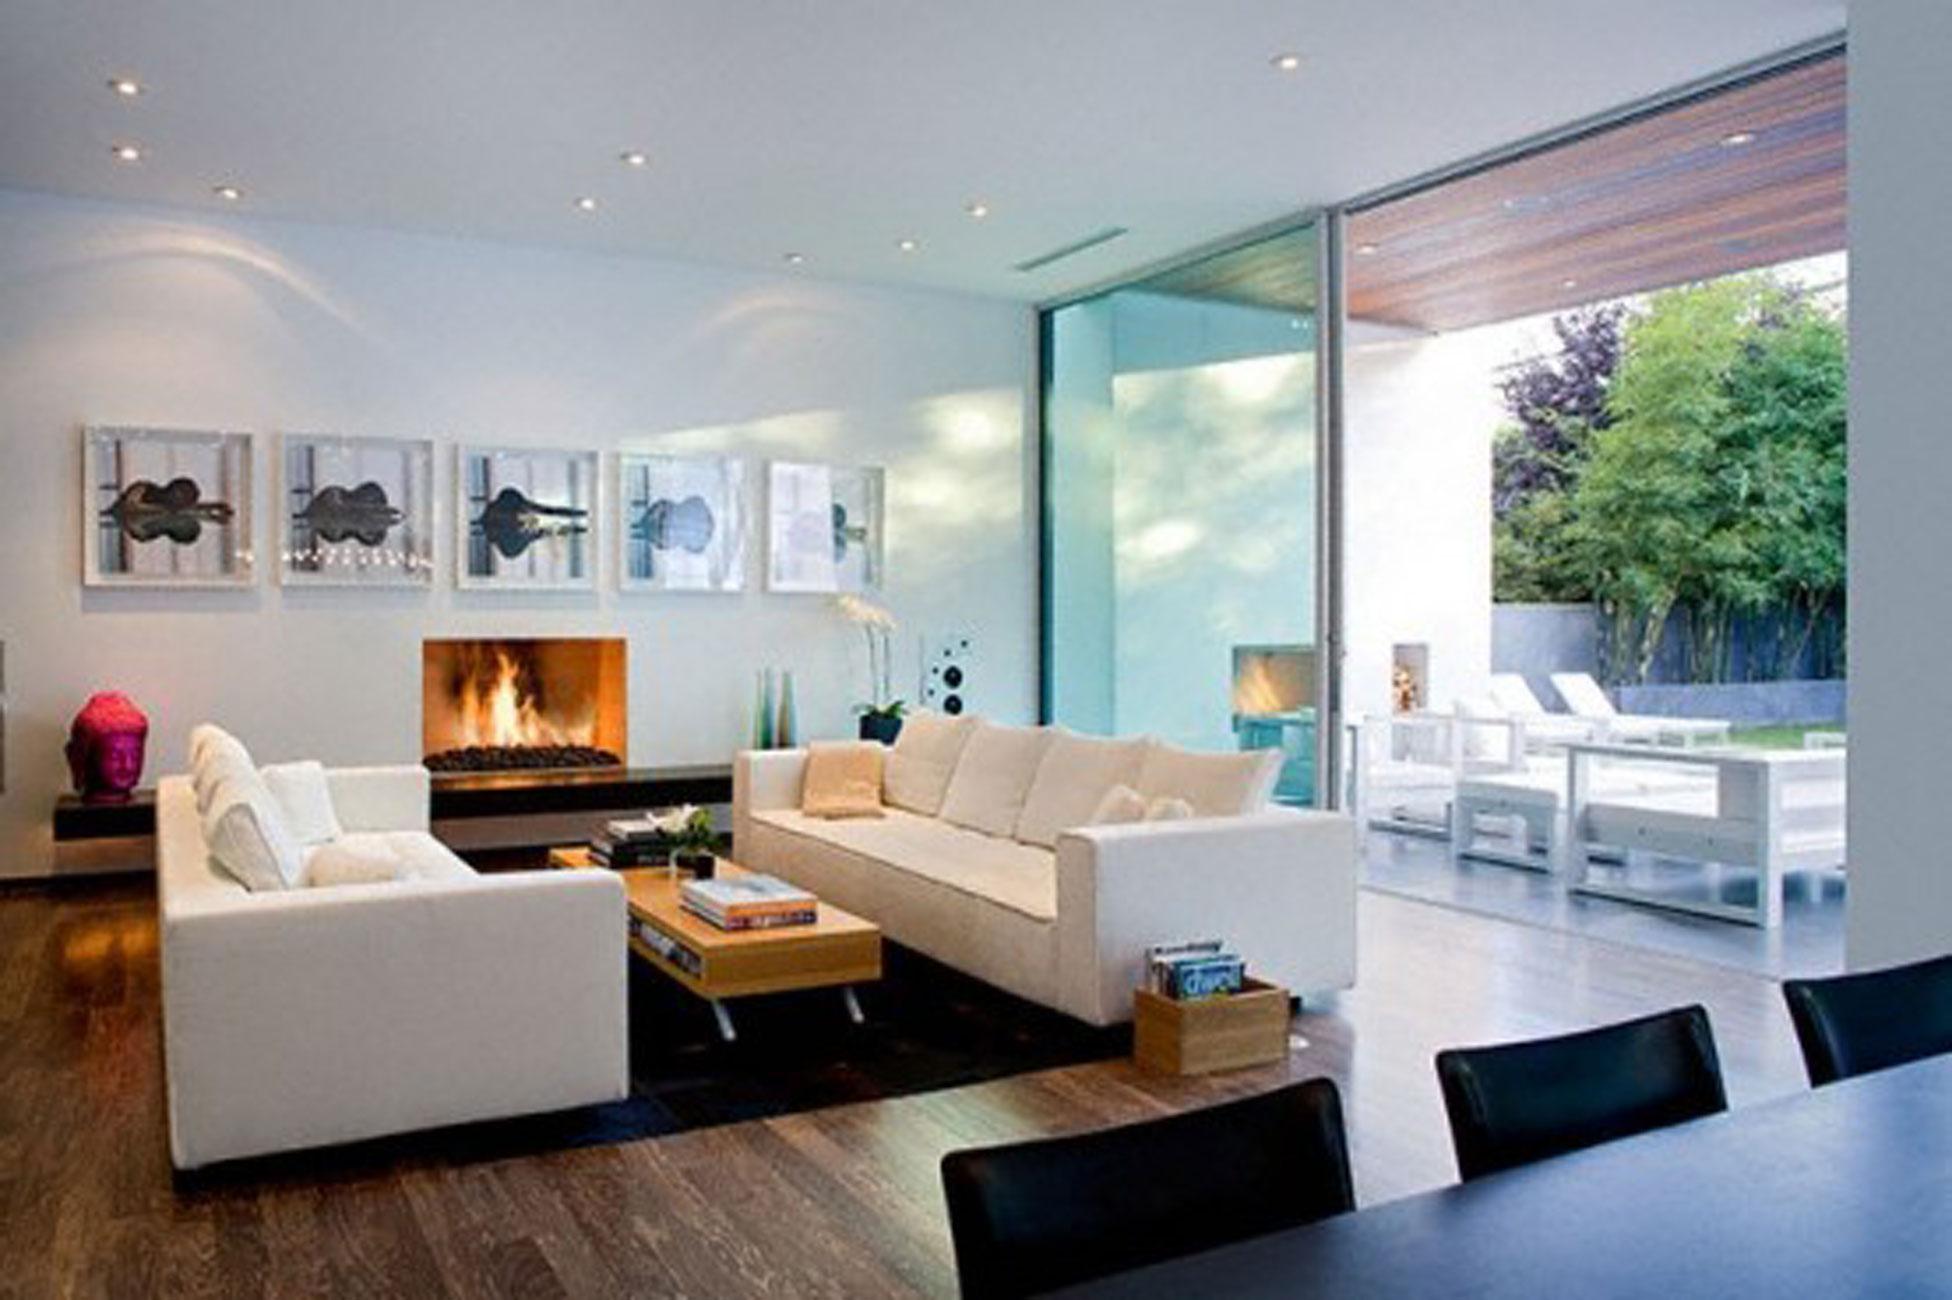 House interior design great modern house interior design minimalist design for interior design UIHDKXH